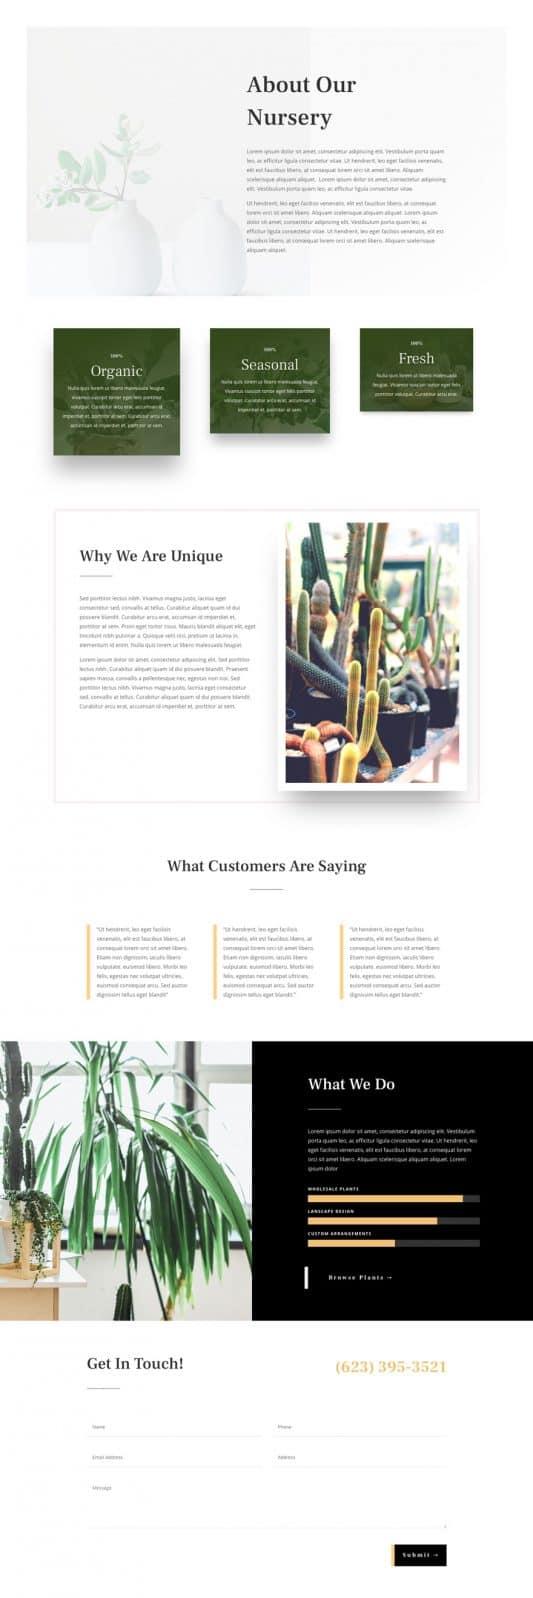 Plant Nursery Web Design 1